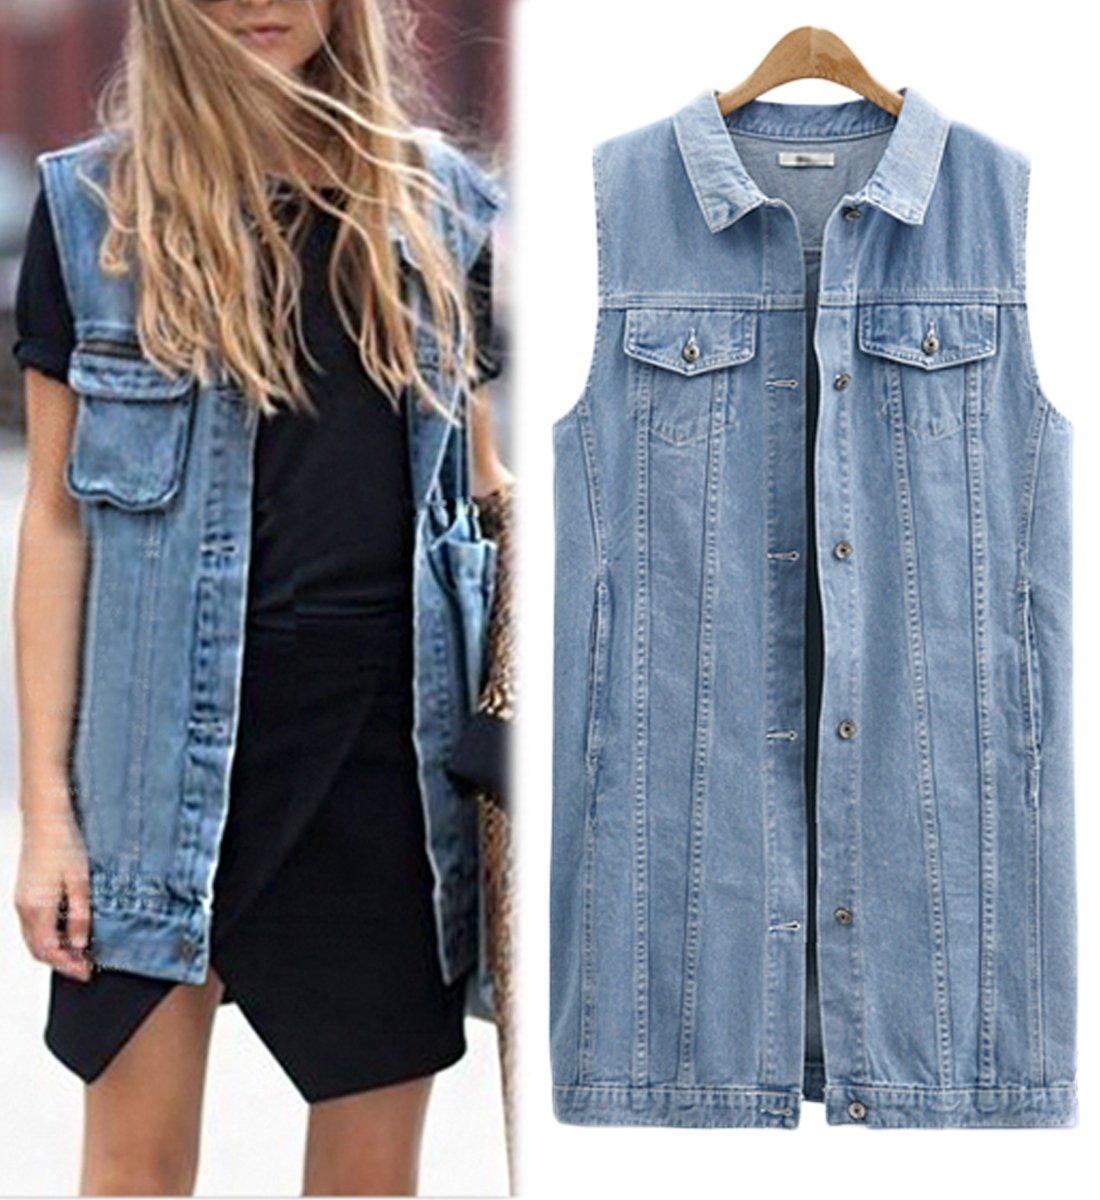 Innifer Women Plus Size Casual Lapel Sleeveless Button up Jean Denim Jacket Vest